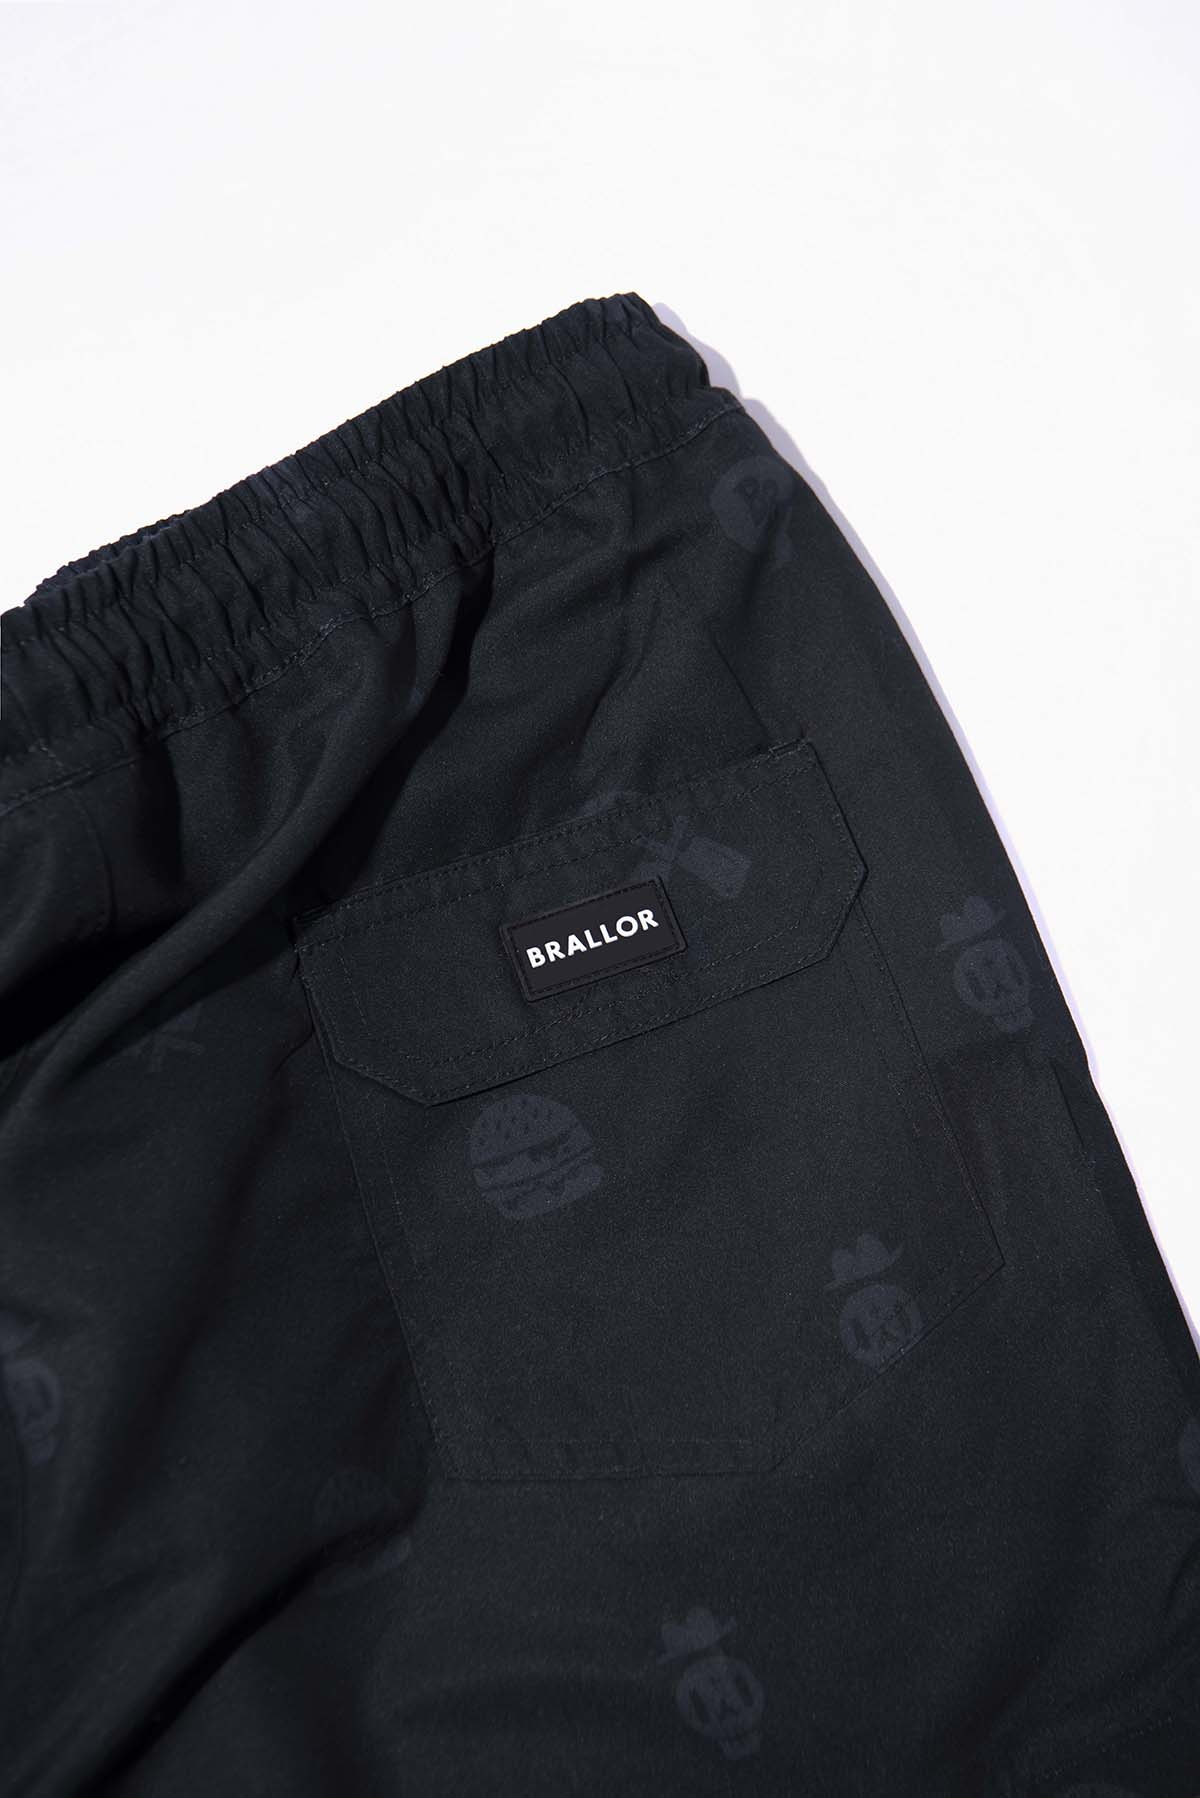 Black Icon Shorts Detail